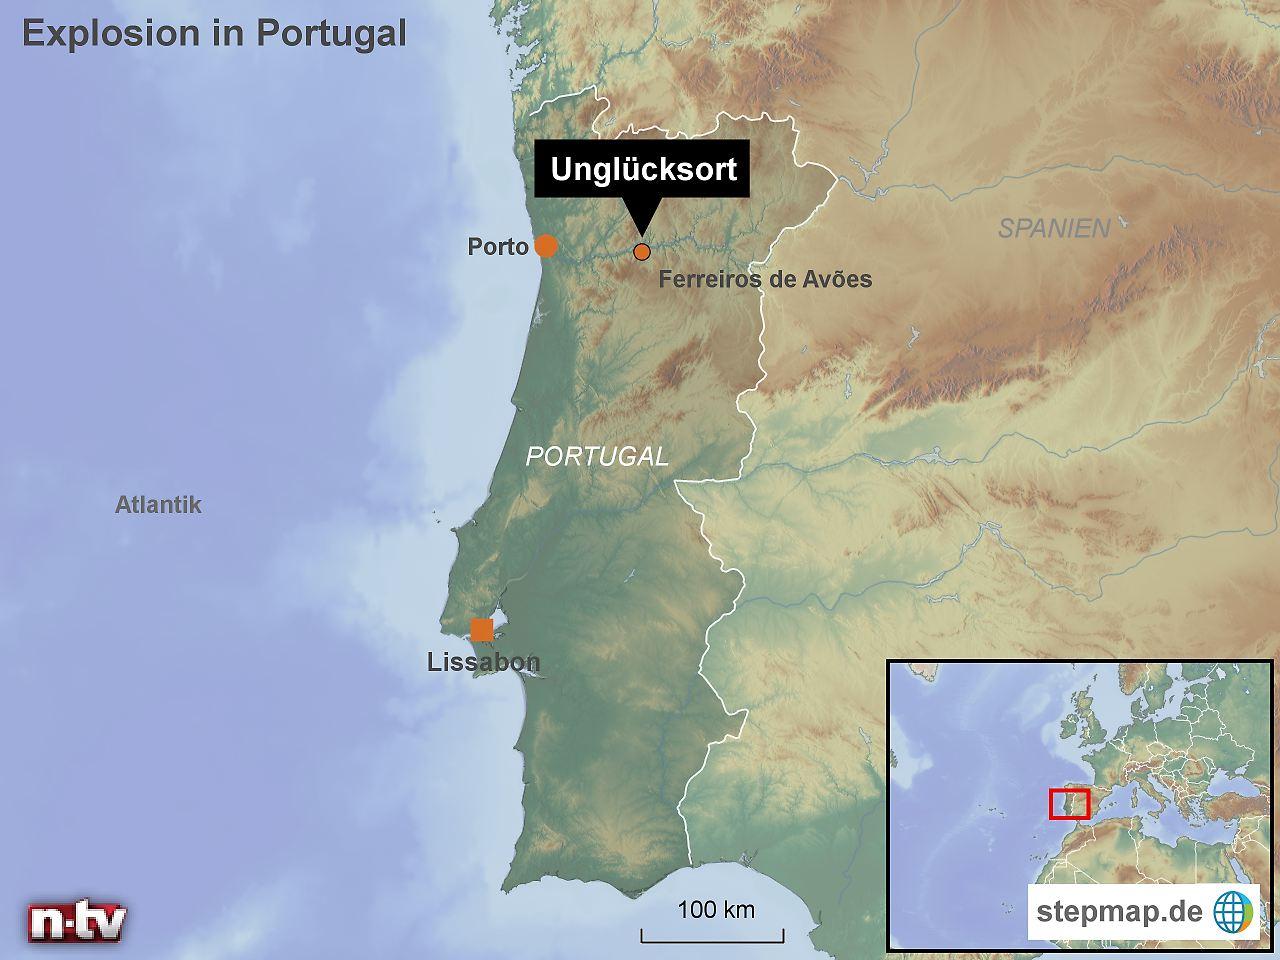 Explosionen in Feuerwerksfabrik in Portugal - Mindestens fünf Tote